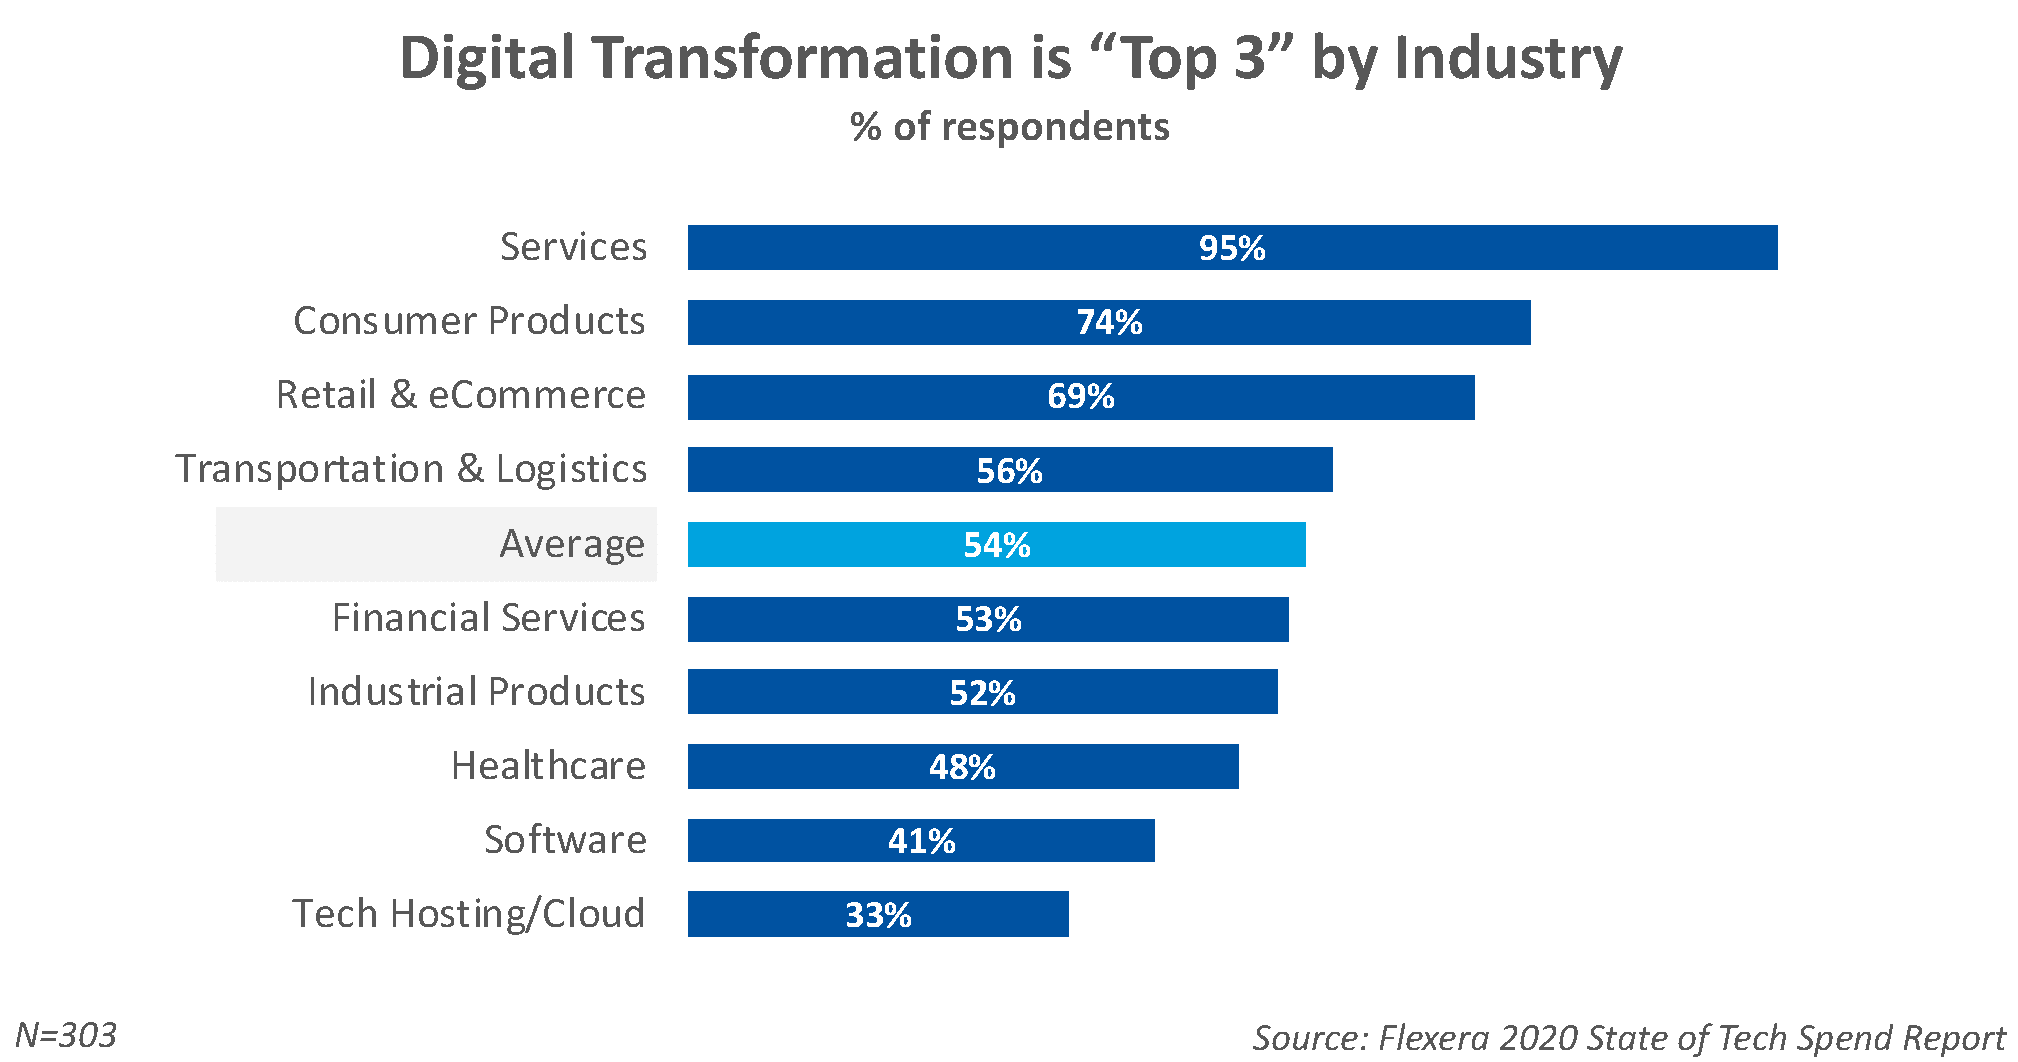 Digital Transformation by Industry